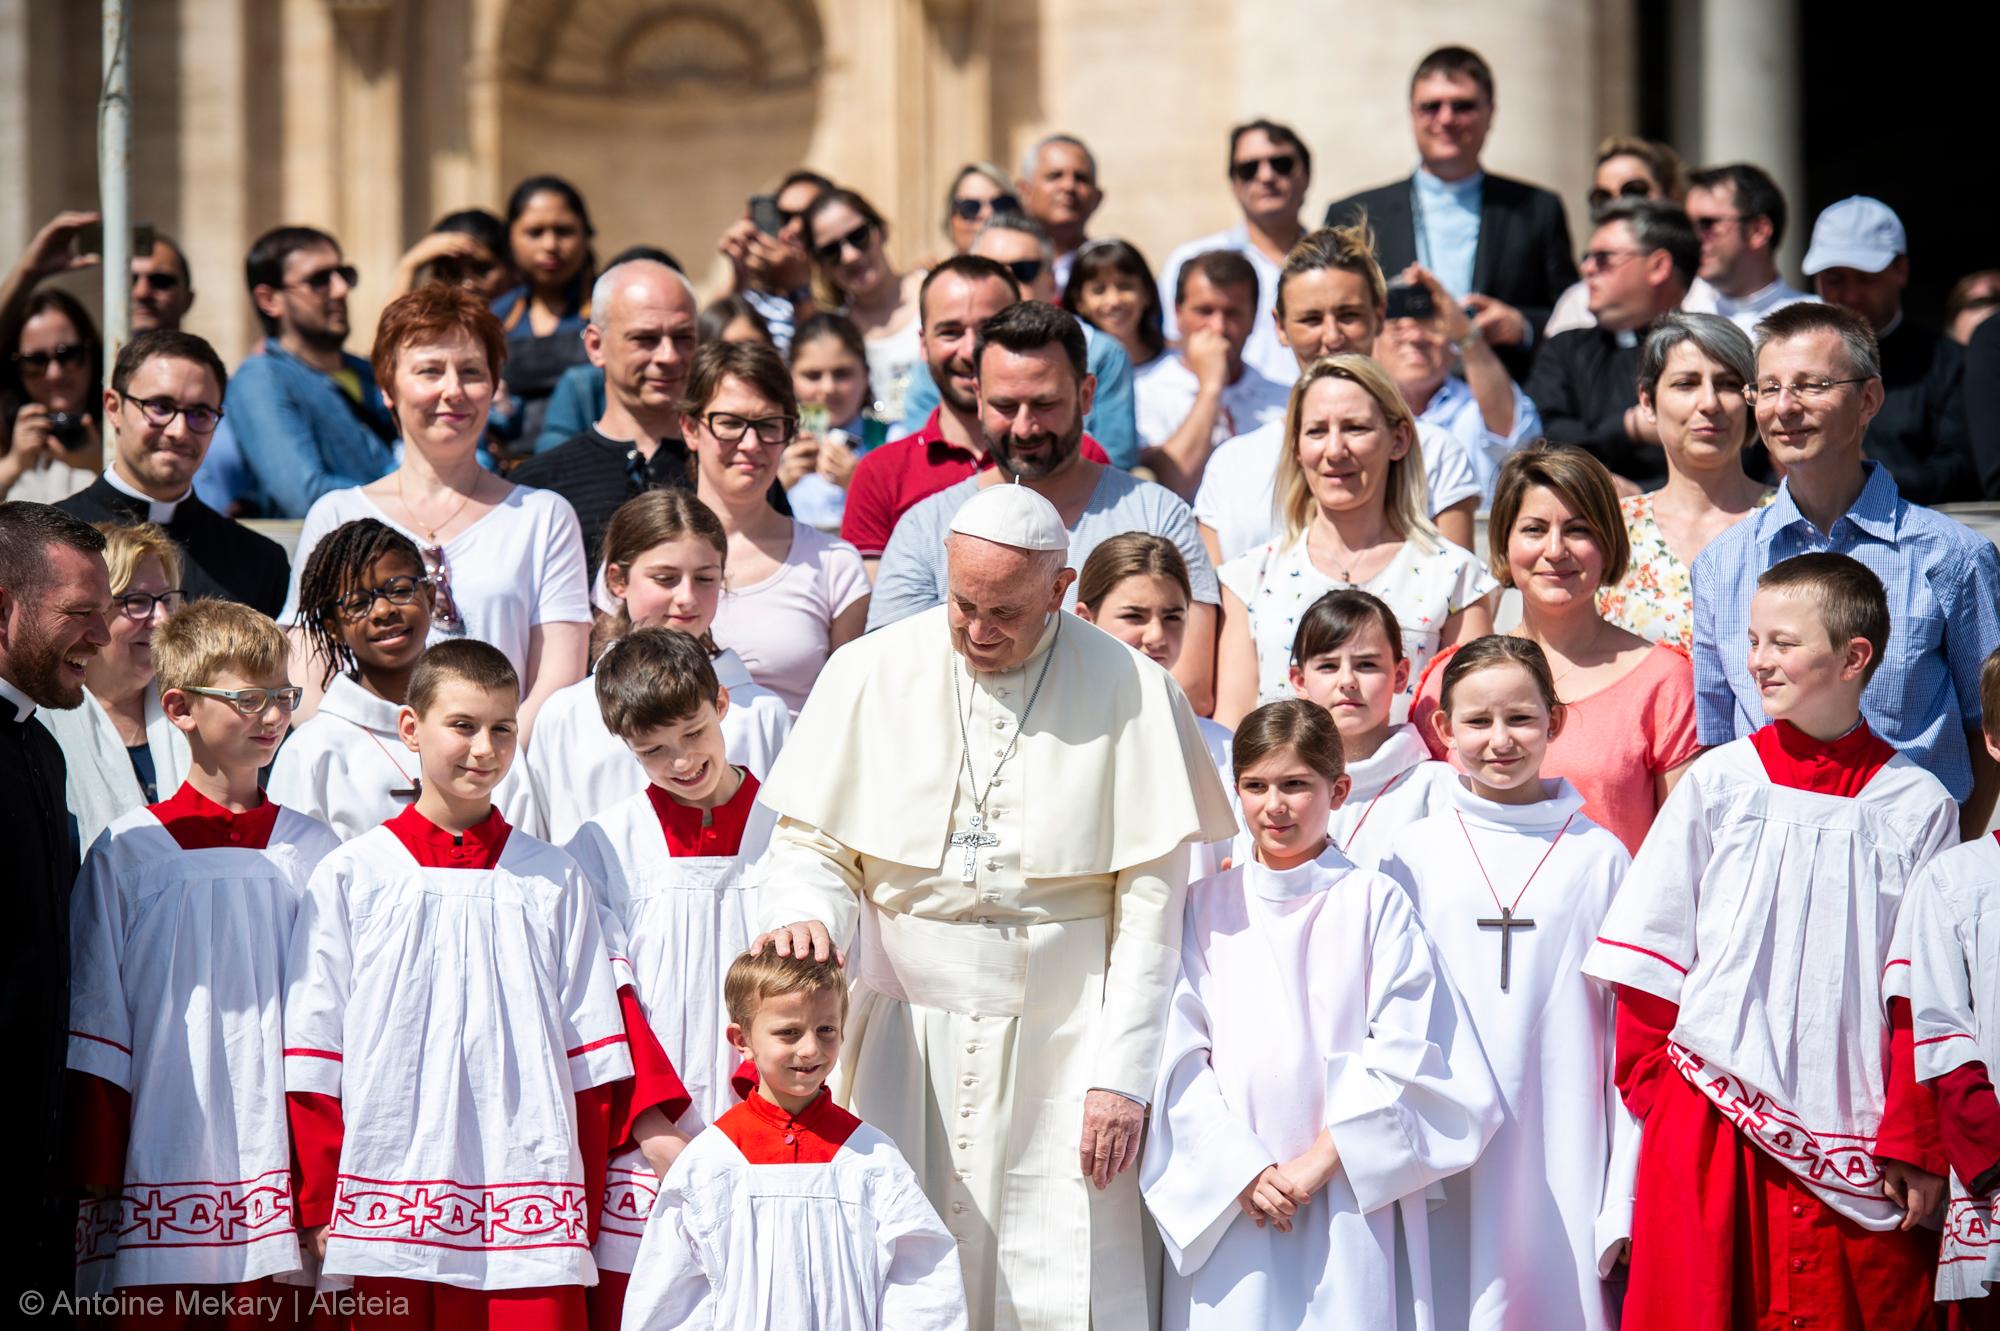 POPE FRANCIS,ALTAR SERVERS